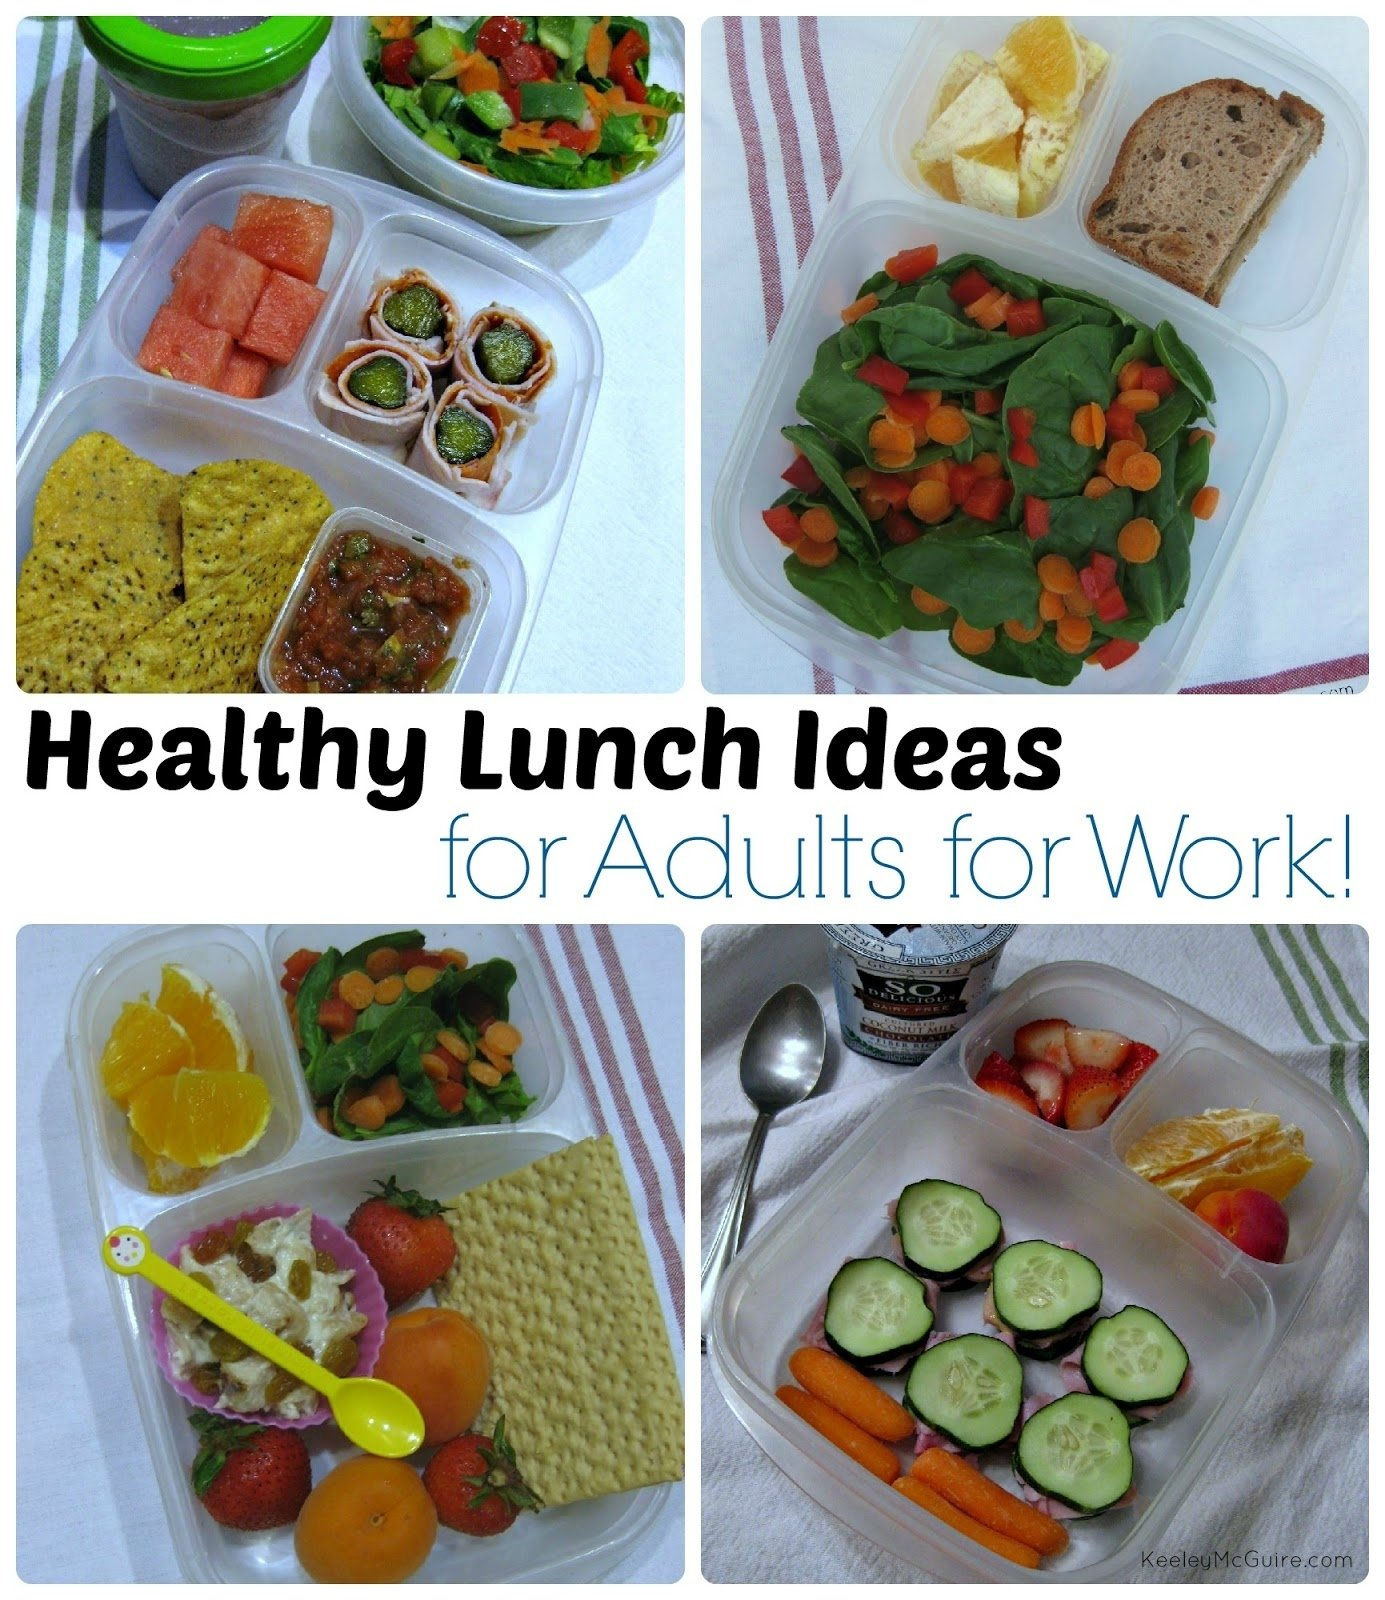 10 Elegant Easy Healthy Lunch Ideas For Work gluten free allergy friendly lunch made easy healthy adult work 5 2020